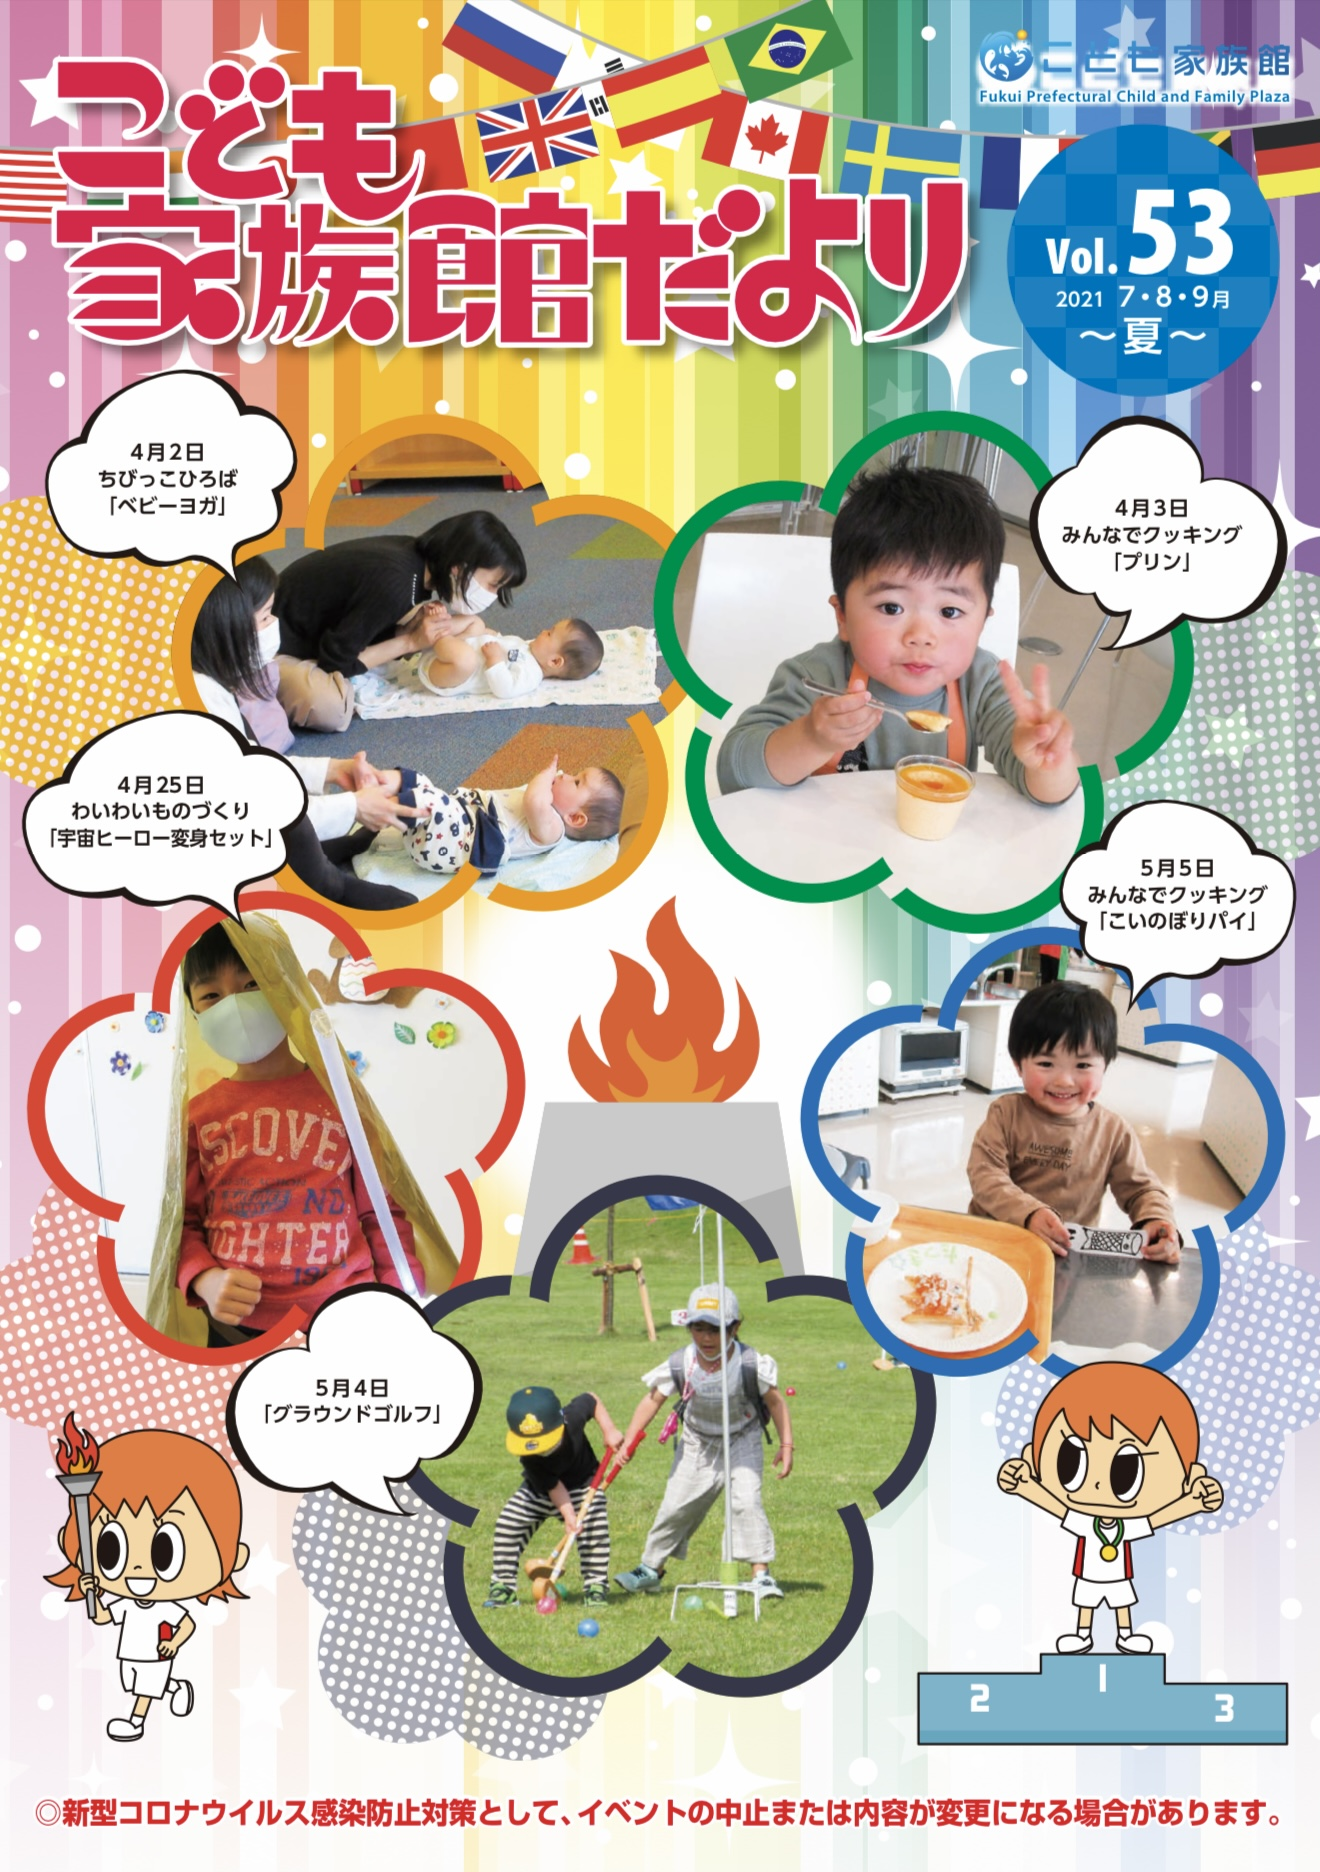 pdf_pho1 最新号